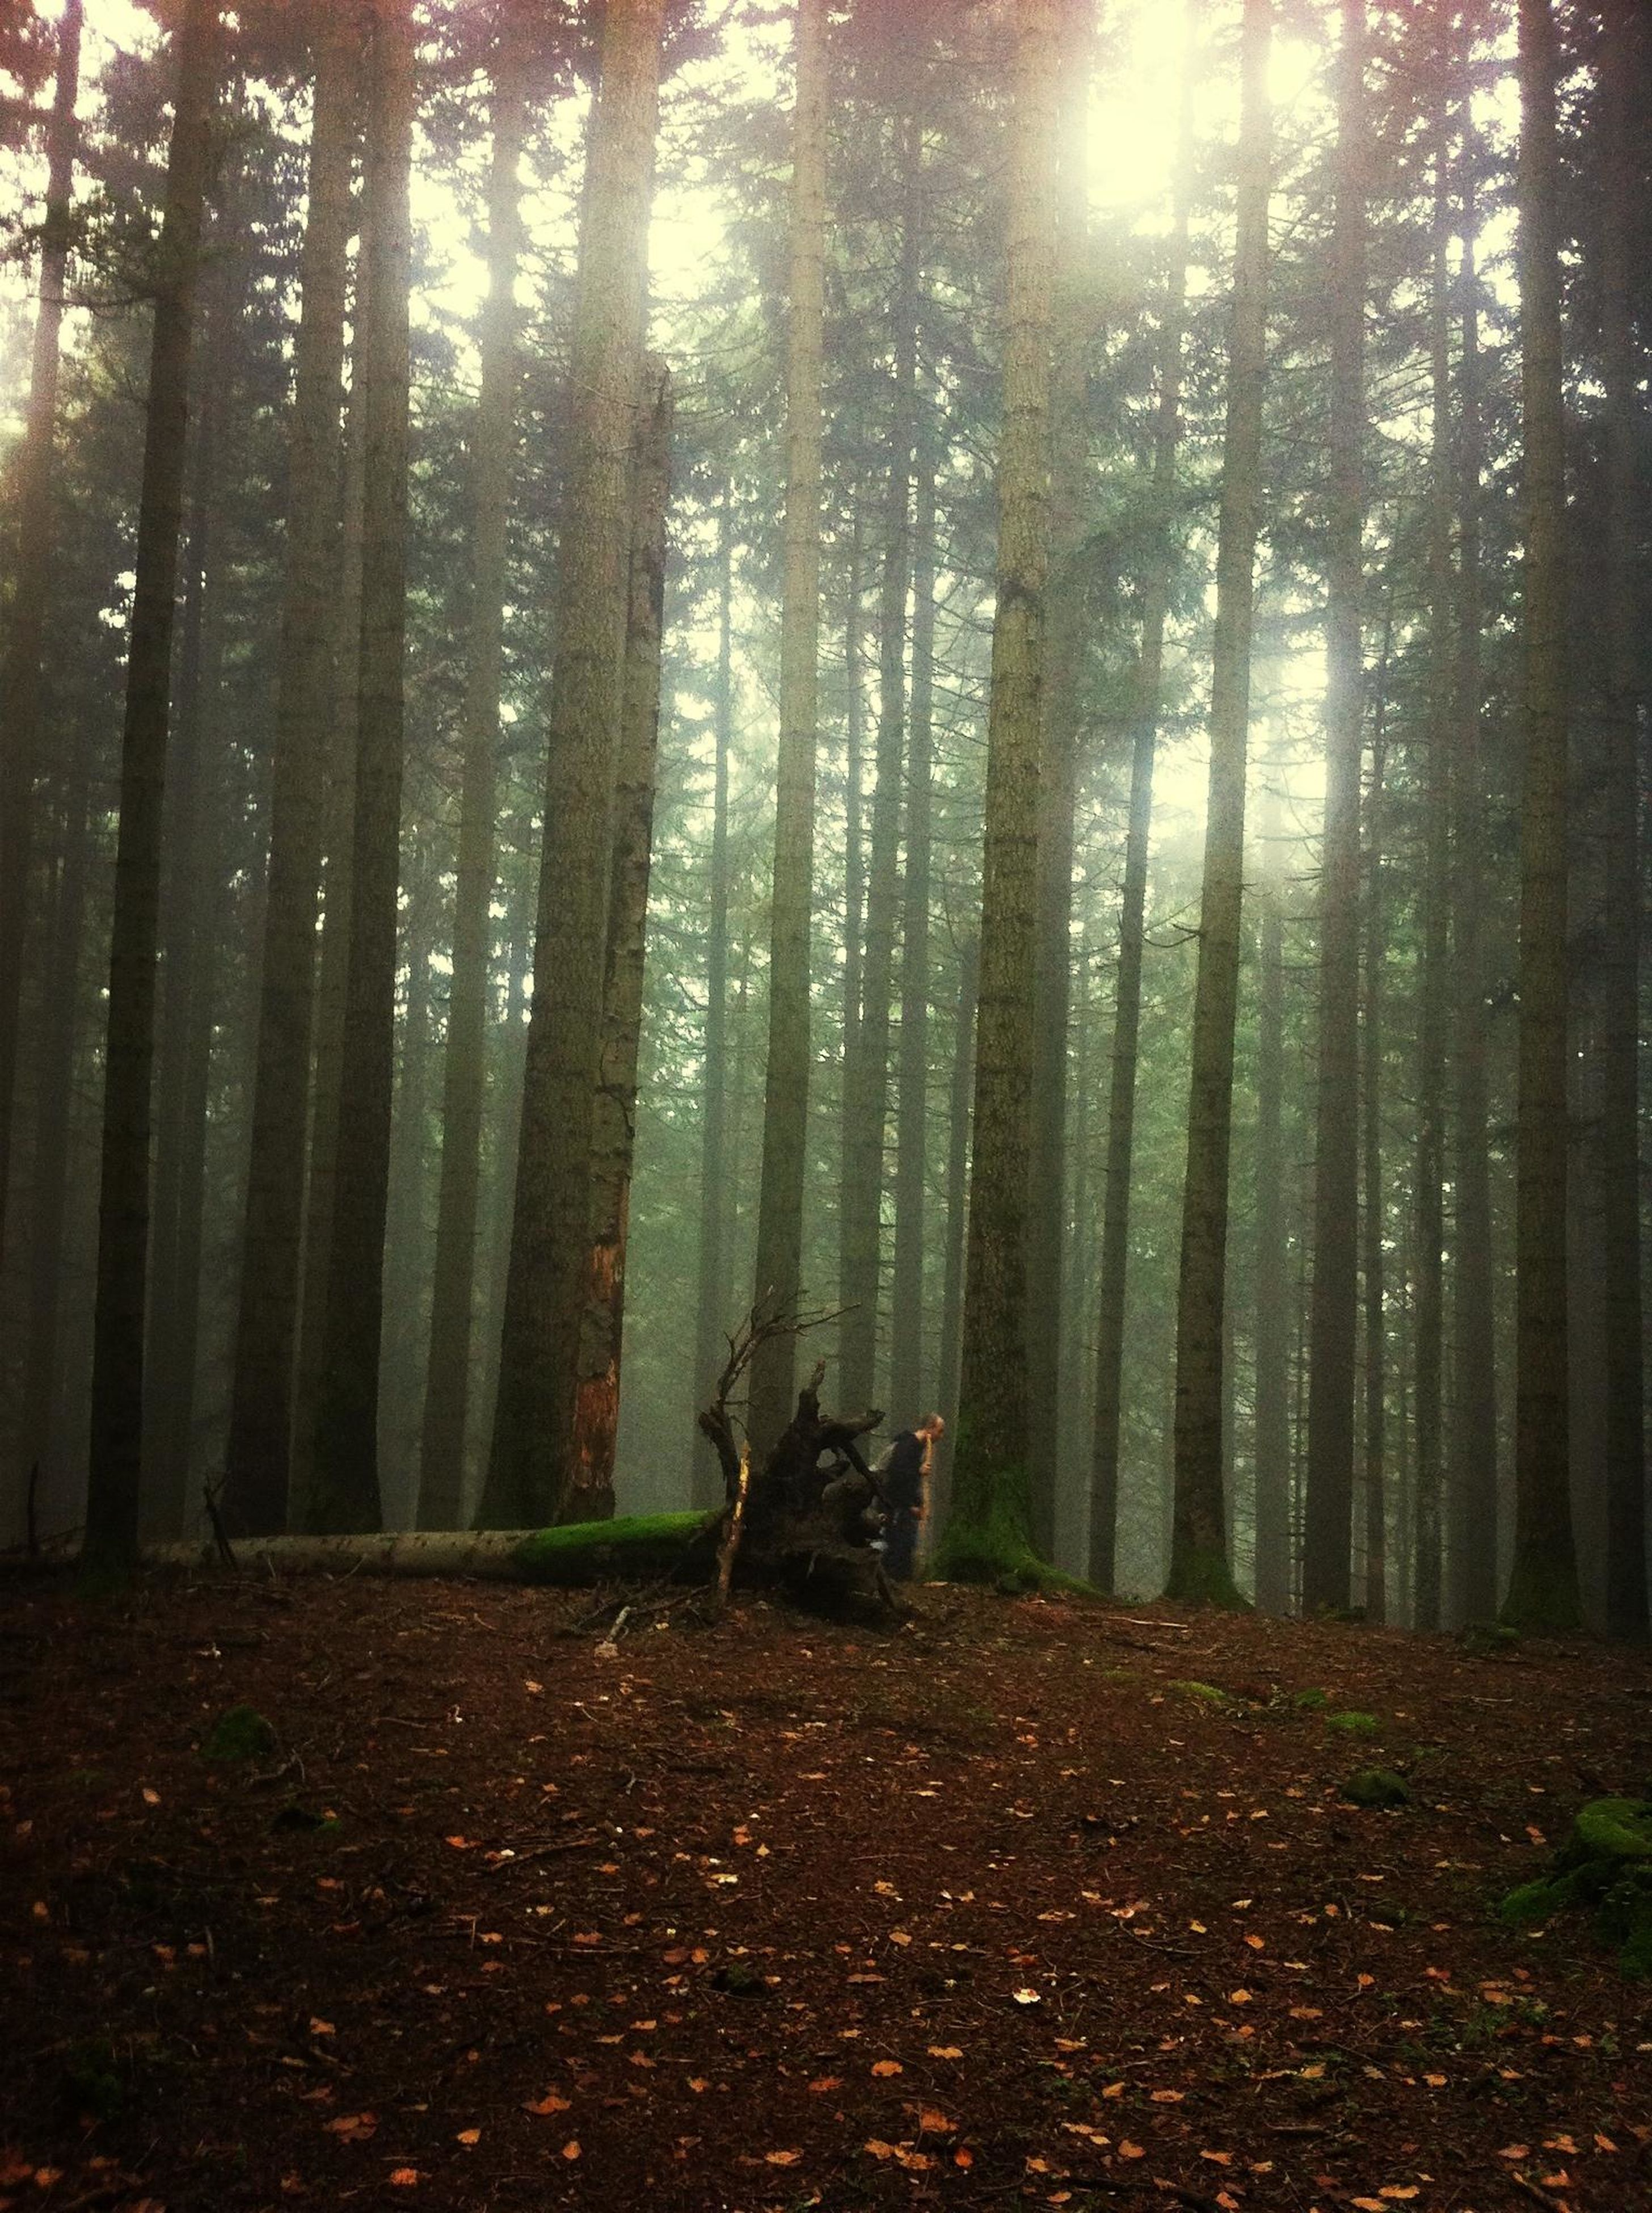 tree, forest, tree trunk, woodland, tranquility, tranquil scene, nature, growth, beauty in nature, scenics, non-urban scene, landscape, sunlight, outdoors, autumn, day, idyllic, the way forward, season, sunbeam